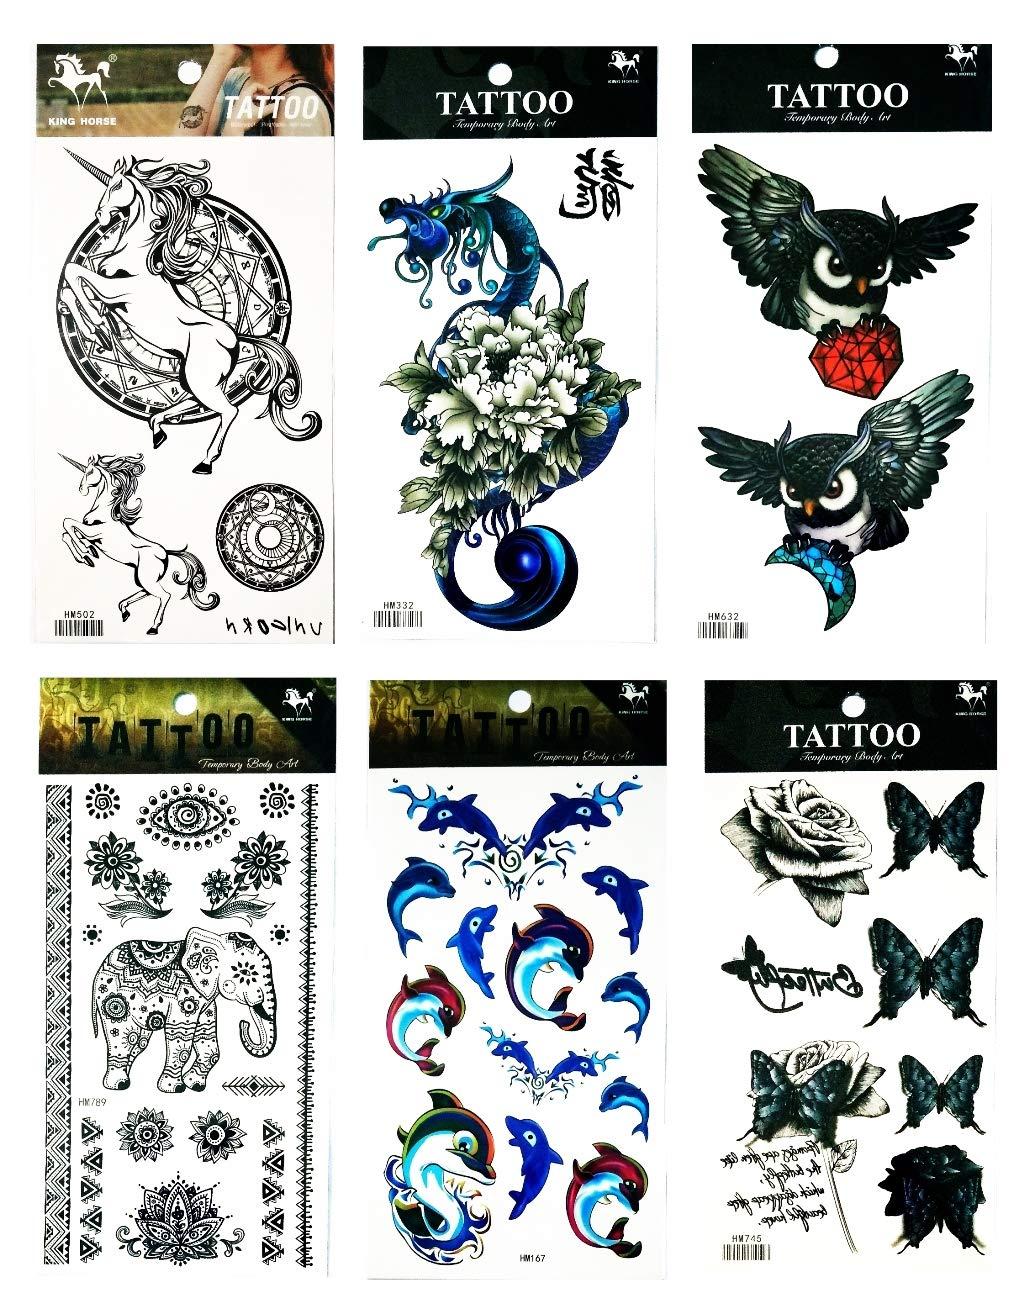 473b37b59f39a NipitShop Tattoos 6 Pcs Butterfly Beautiful Horse Unicorn Fairy Dragon  Flower Owl Diamond Eye Elephant Lotus Flower Buddha Temporary Tattoo Designs  for ...